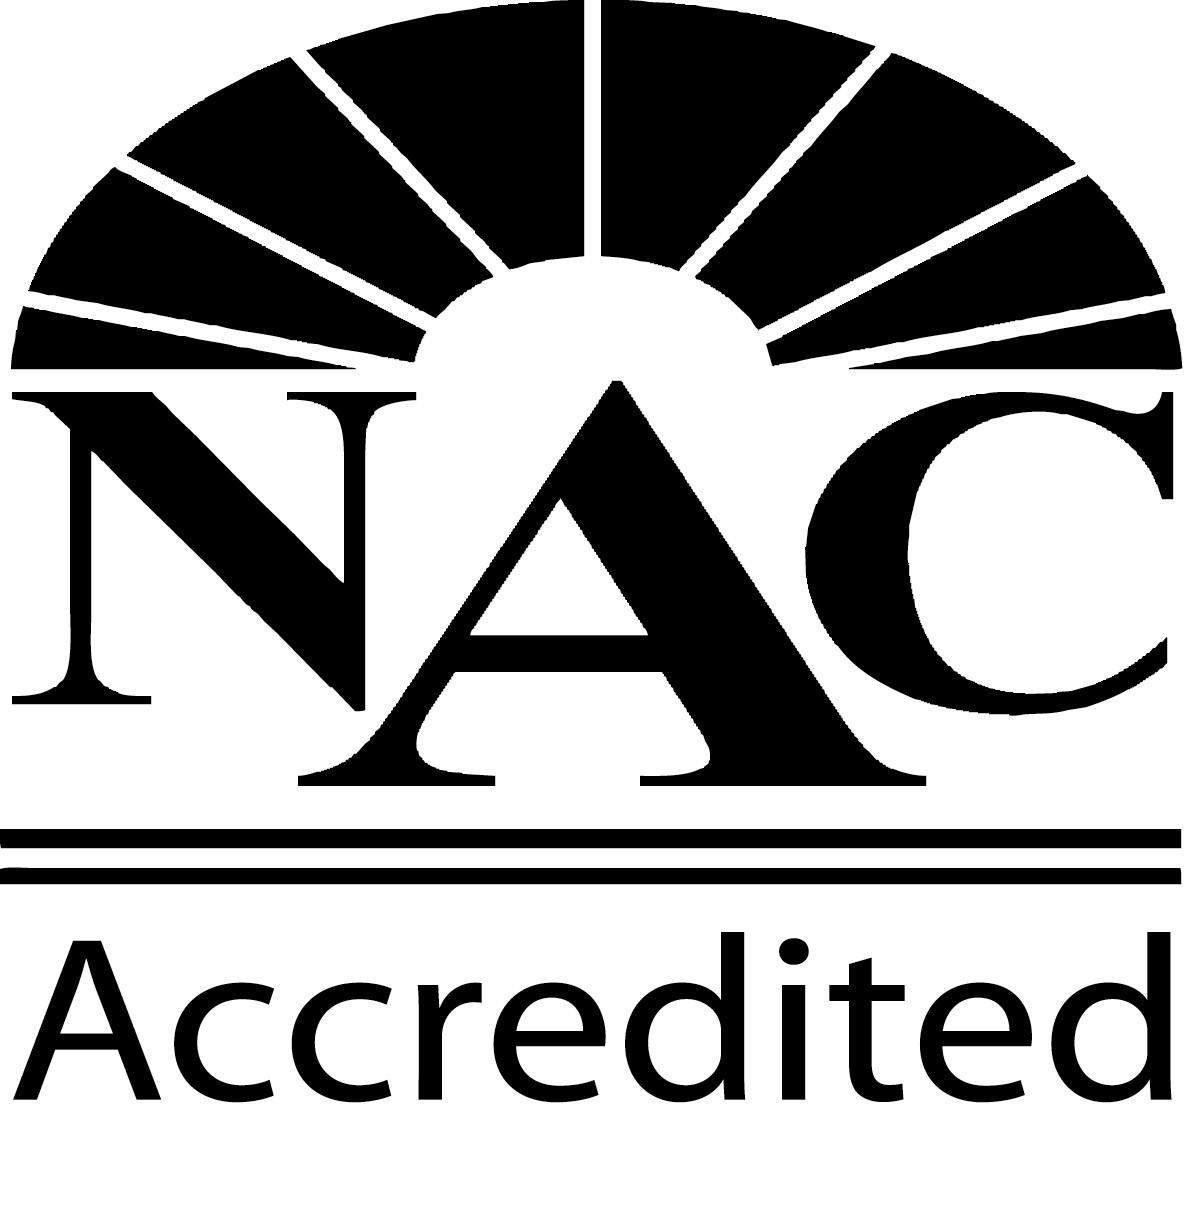 NAC-Accredited-logo.jpg